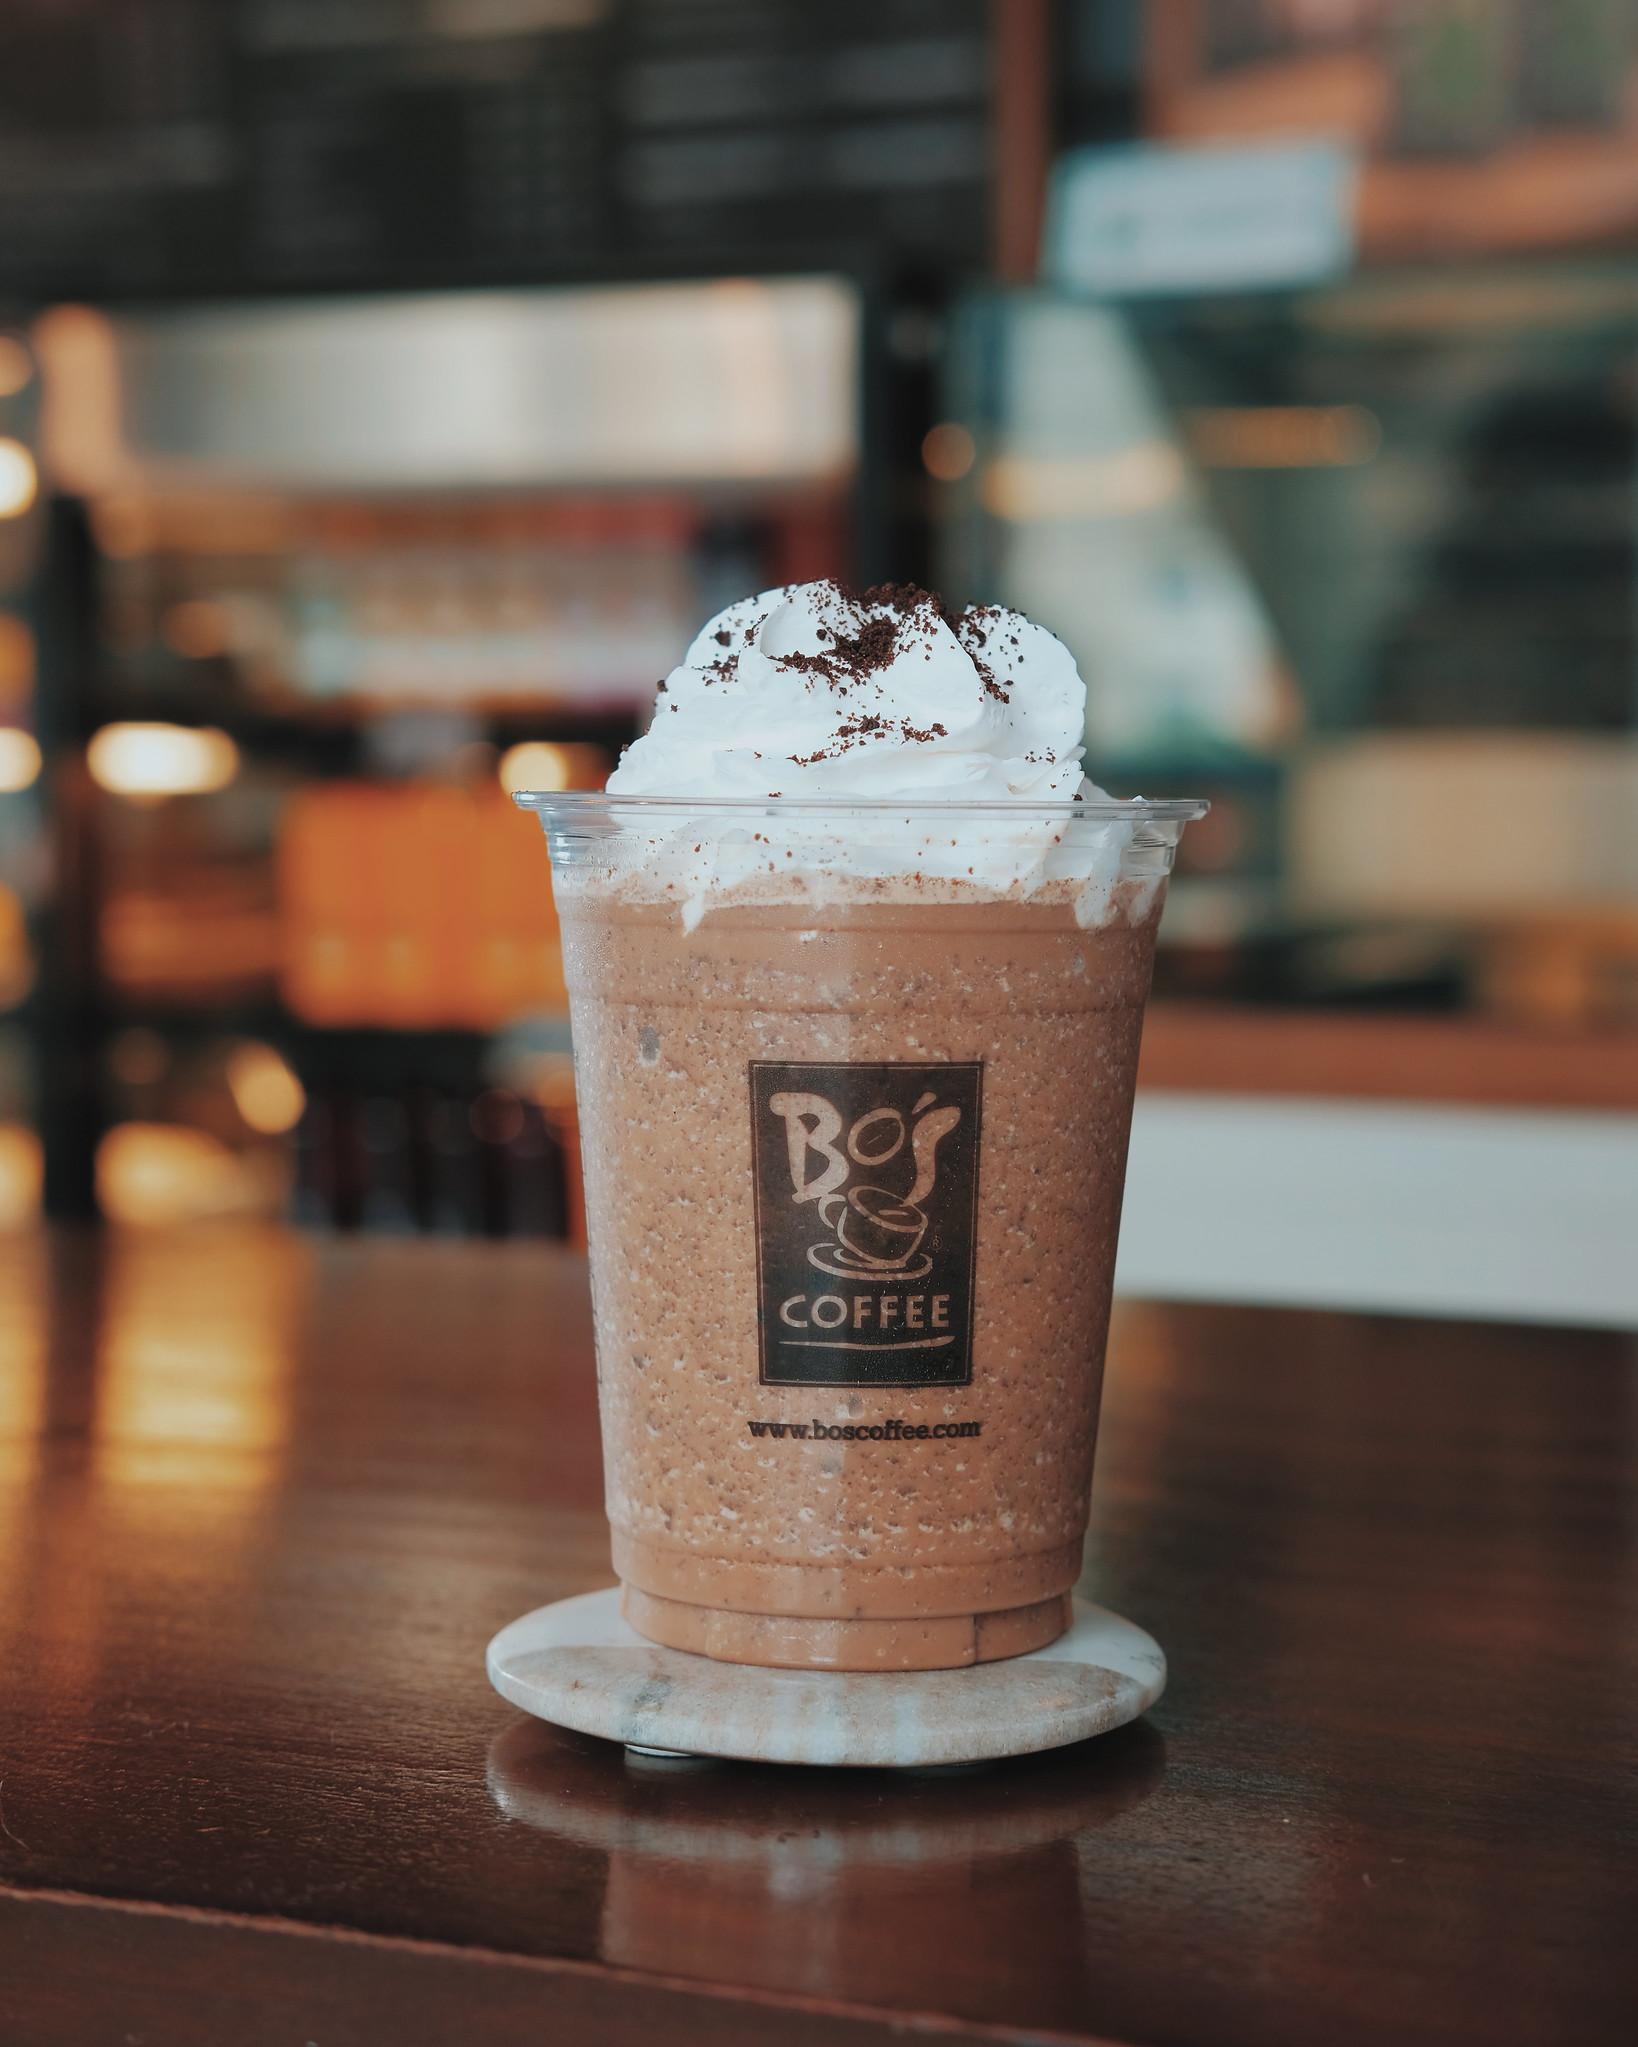 Skip the Line at Bo's Coffee: Order through Messenger